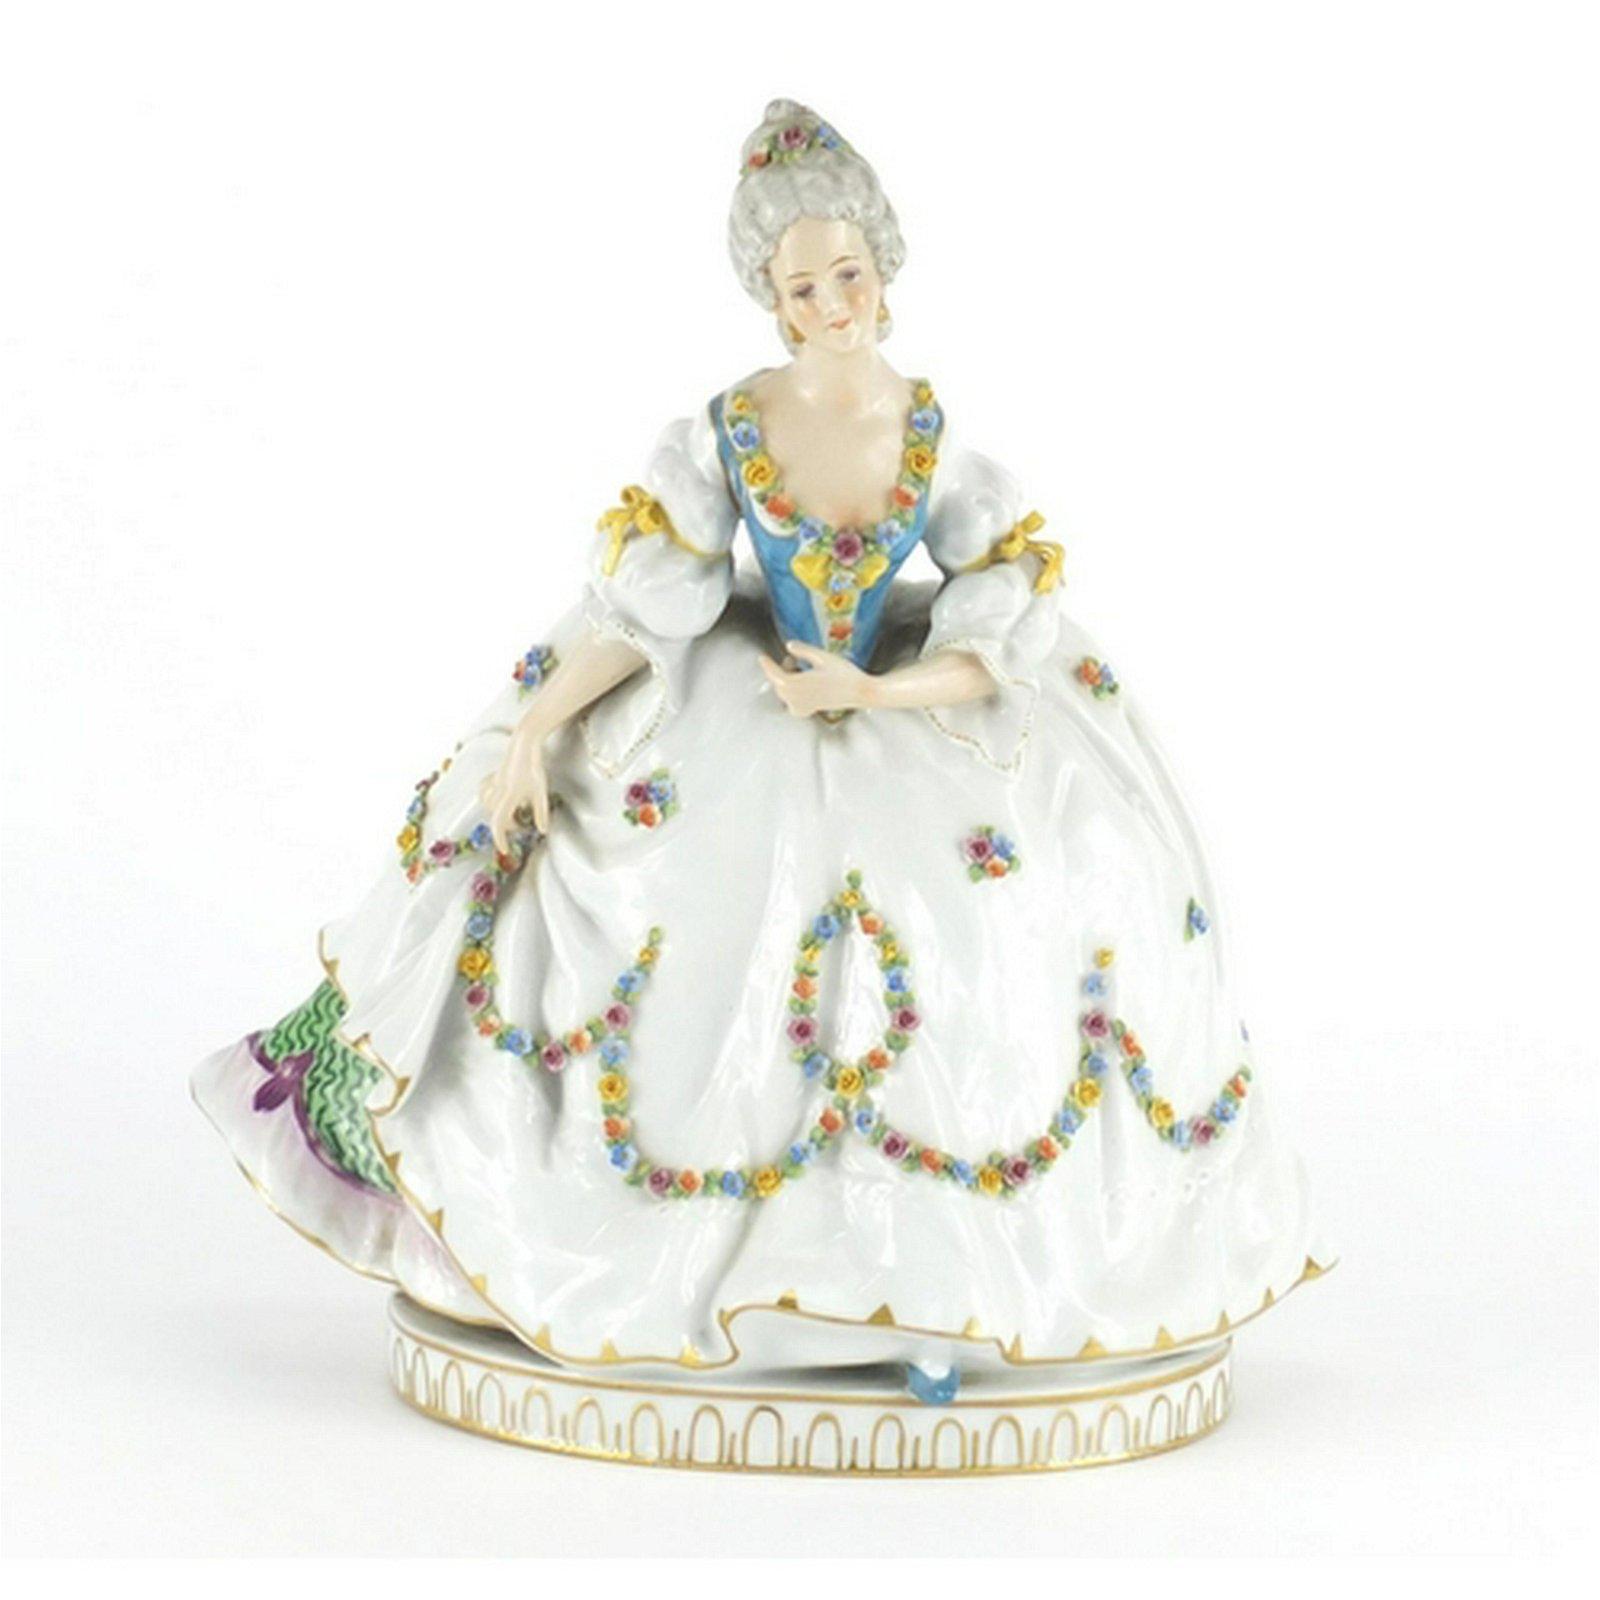 Austrian porcelain figurine of a female wearing a